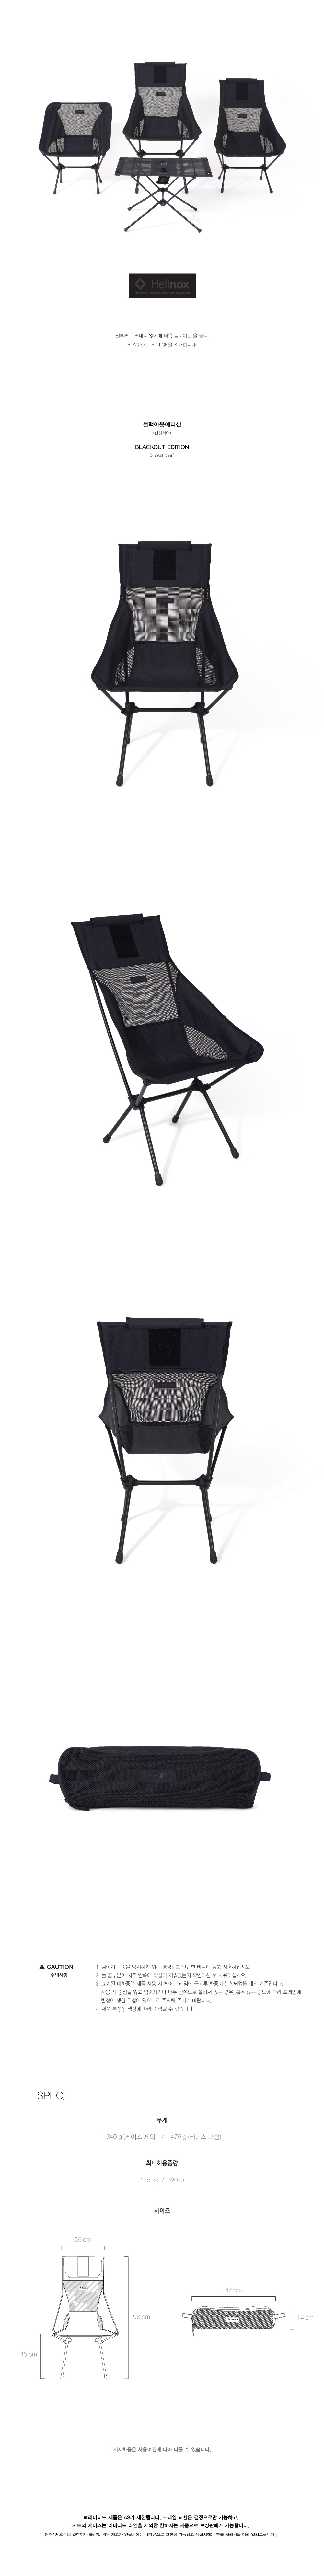 20170621-blackout-edition-sunset-chair-상세페이지.jpg